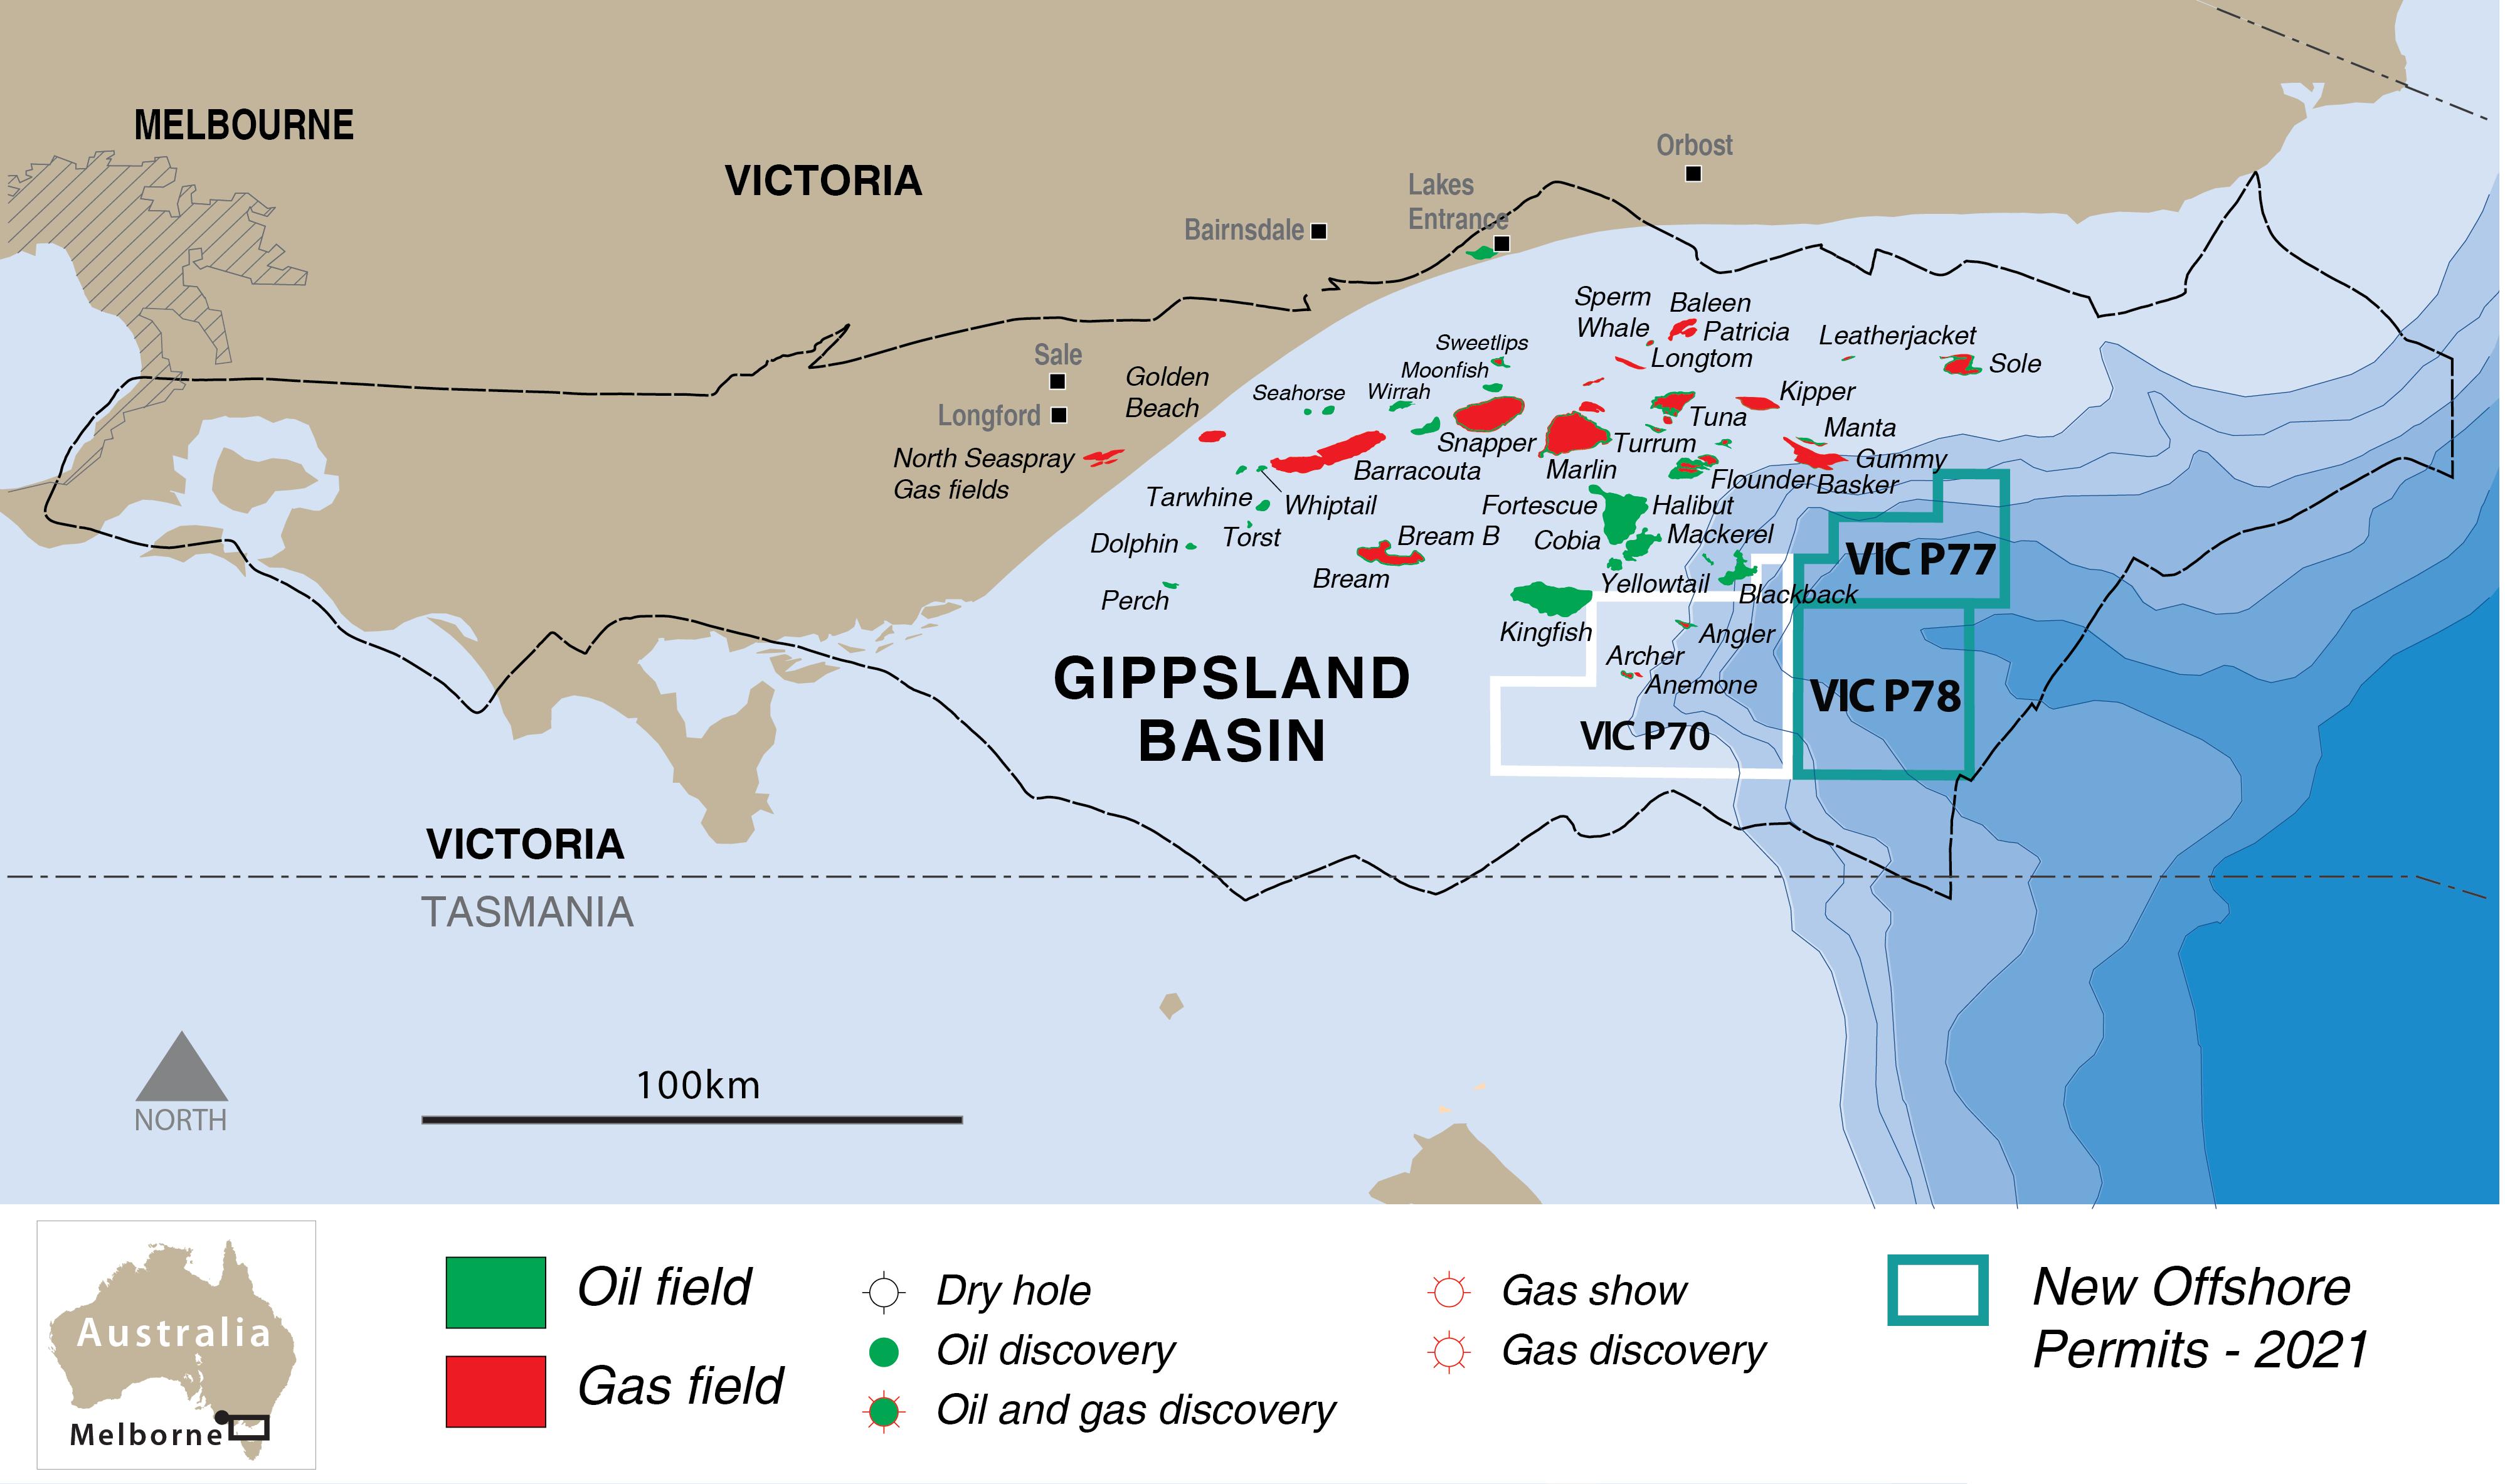 gippsland_basin_map